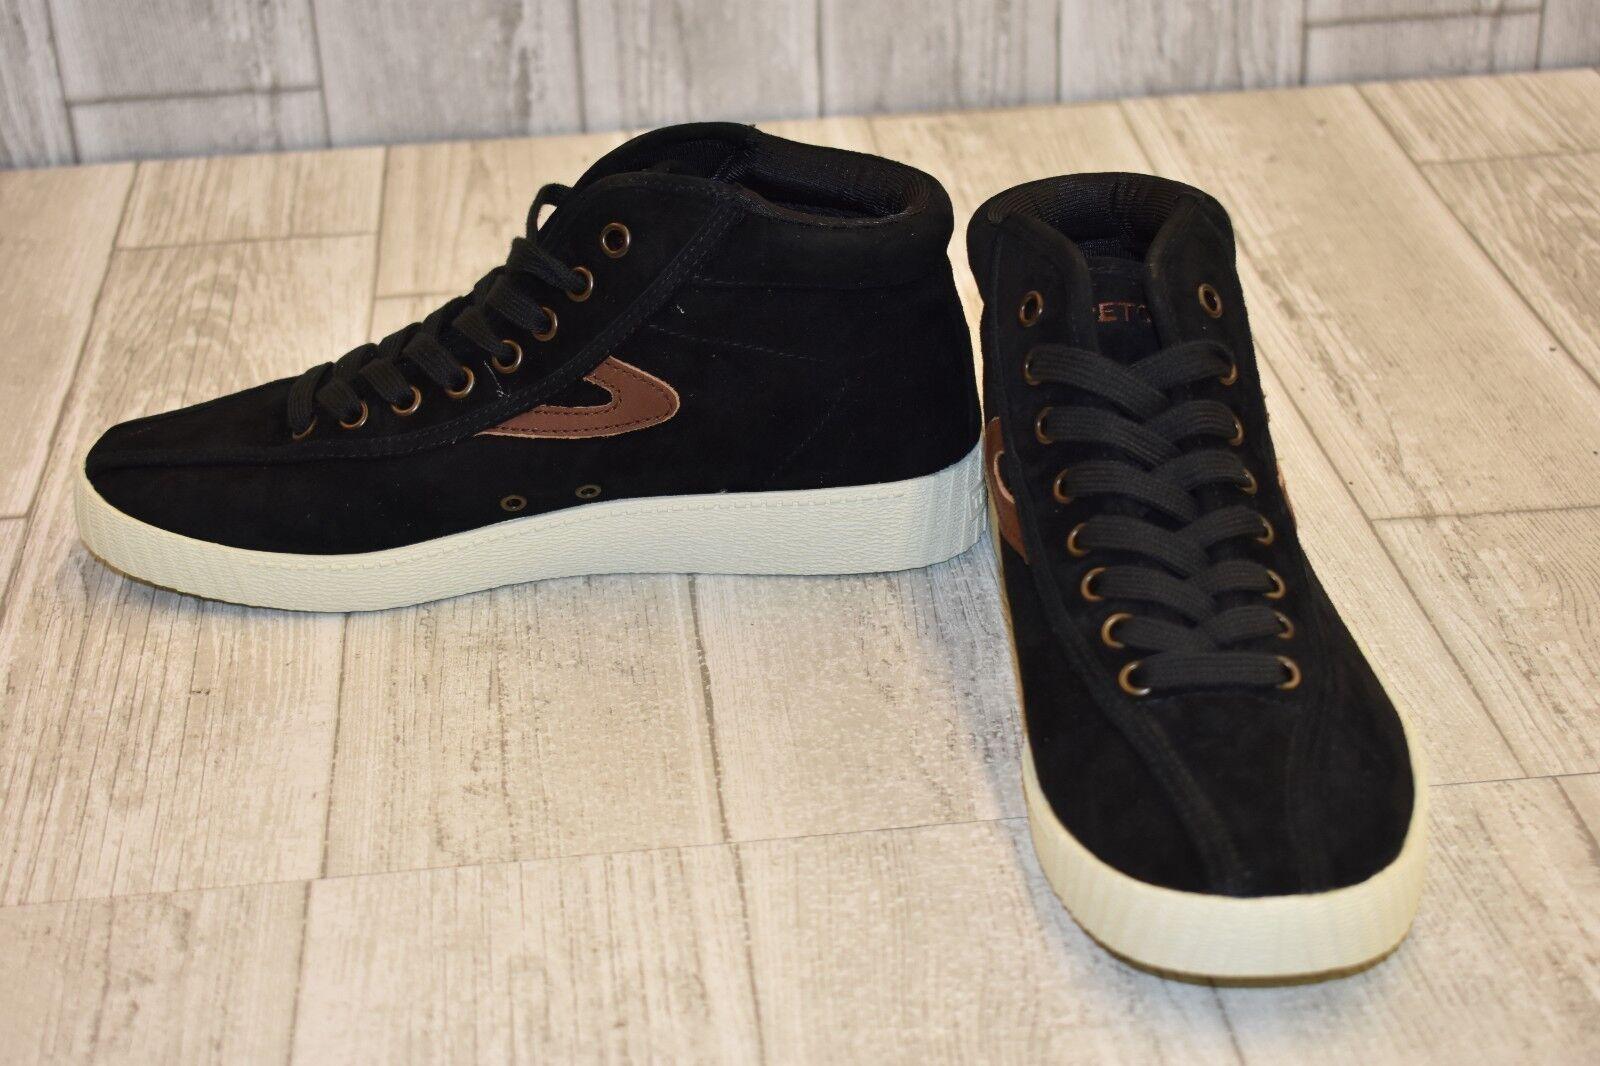 Tretorn NYLITEHI7 Sneakers - Men's Size 7 - Black